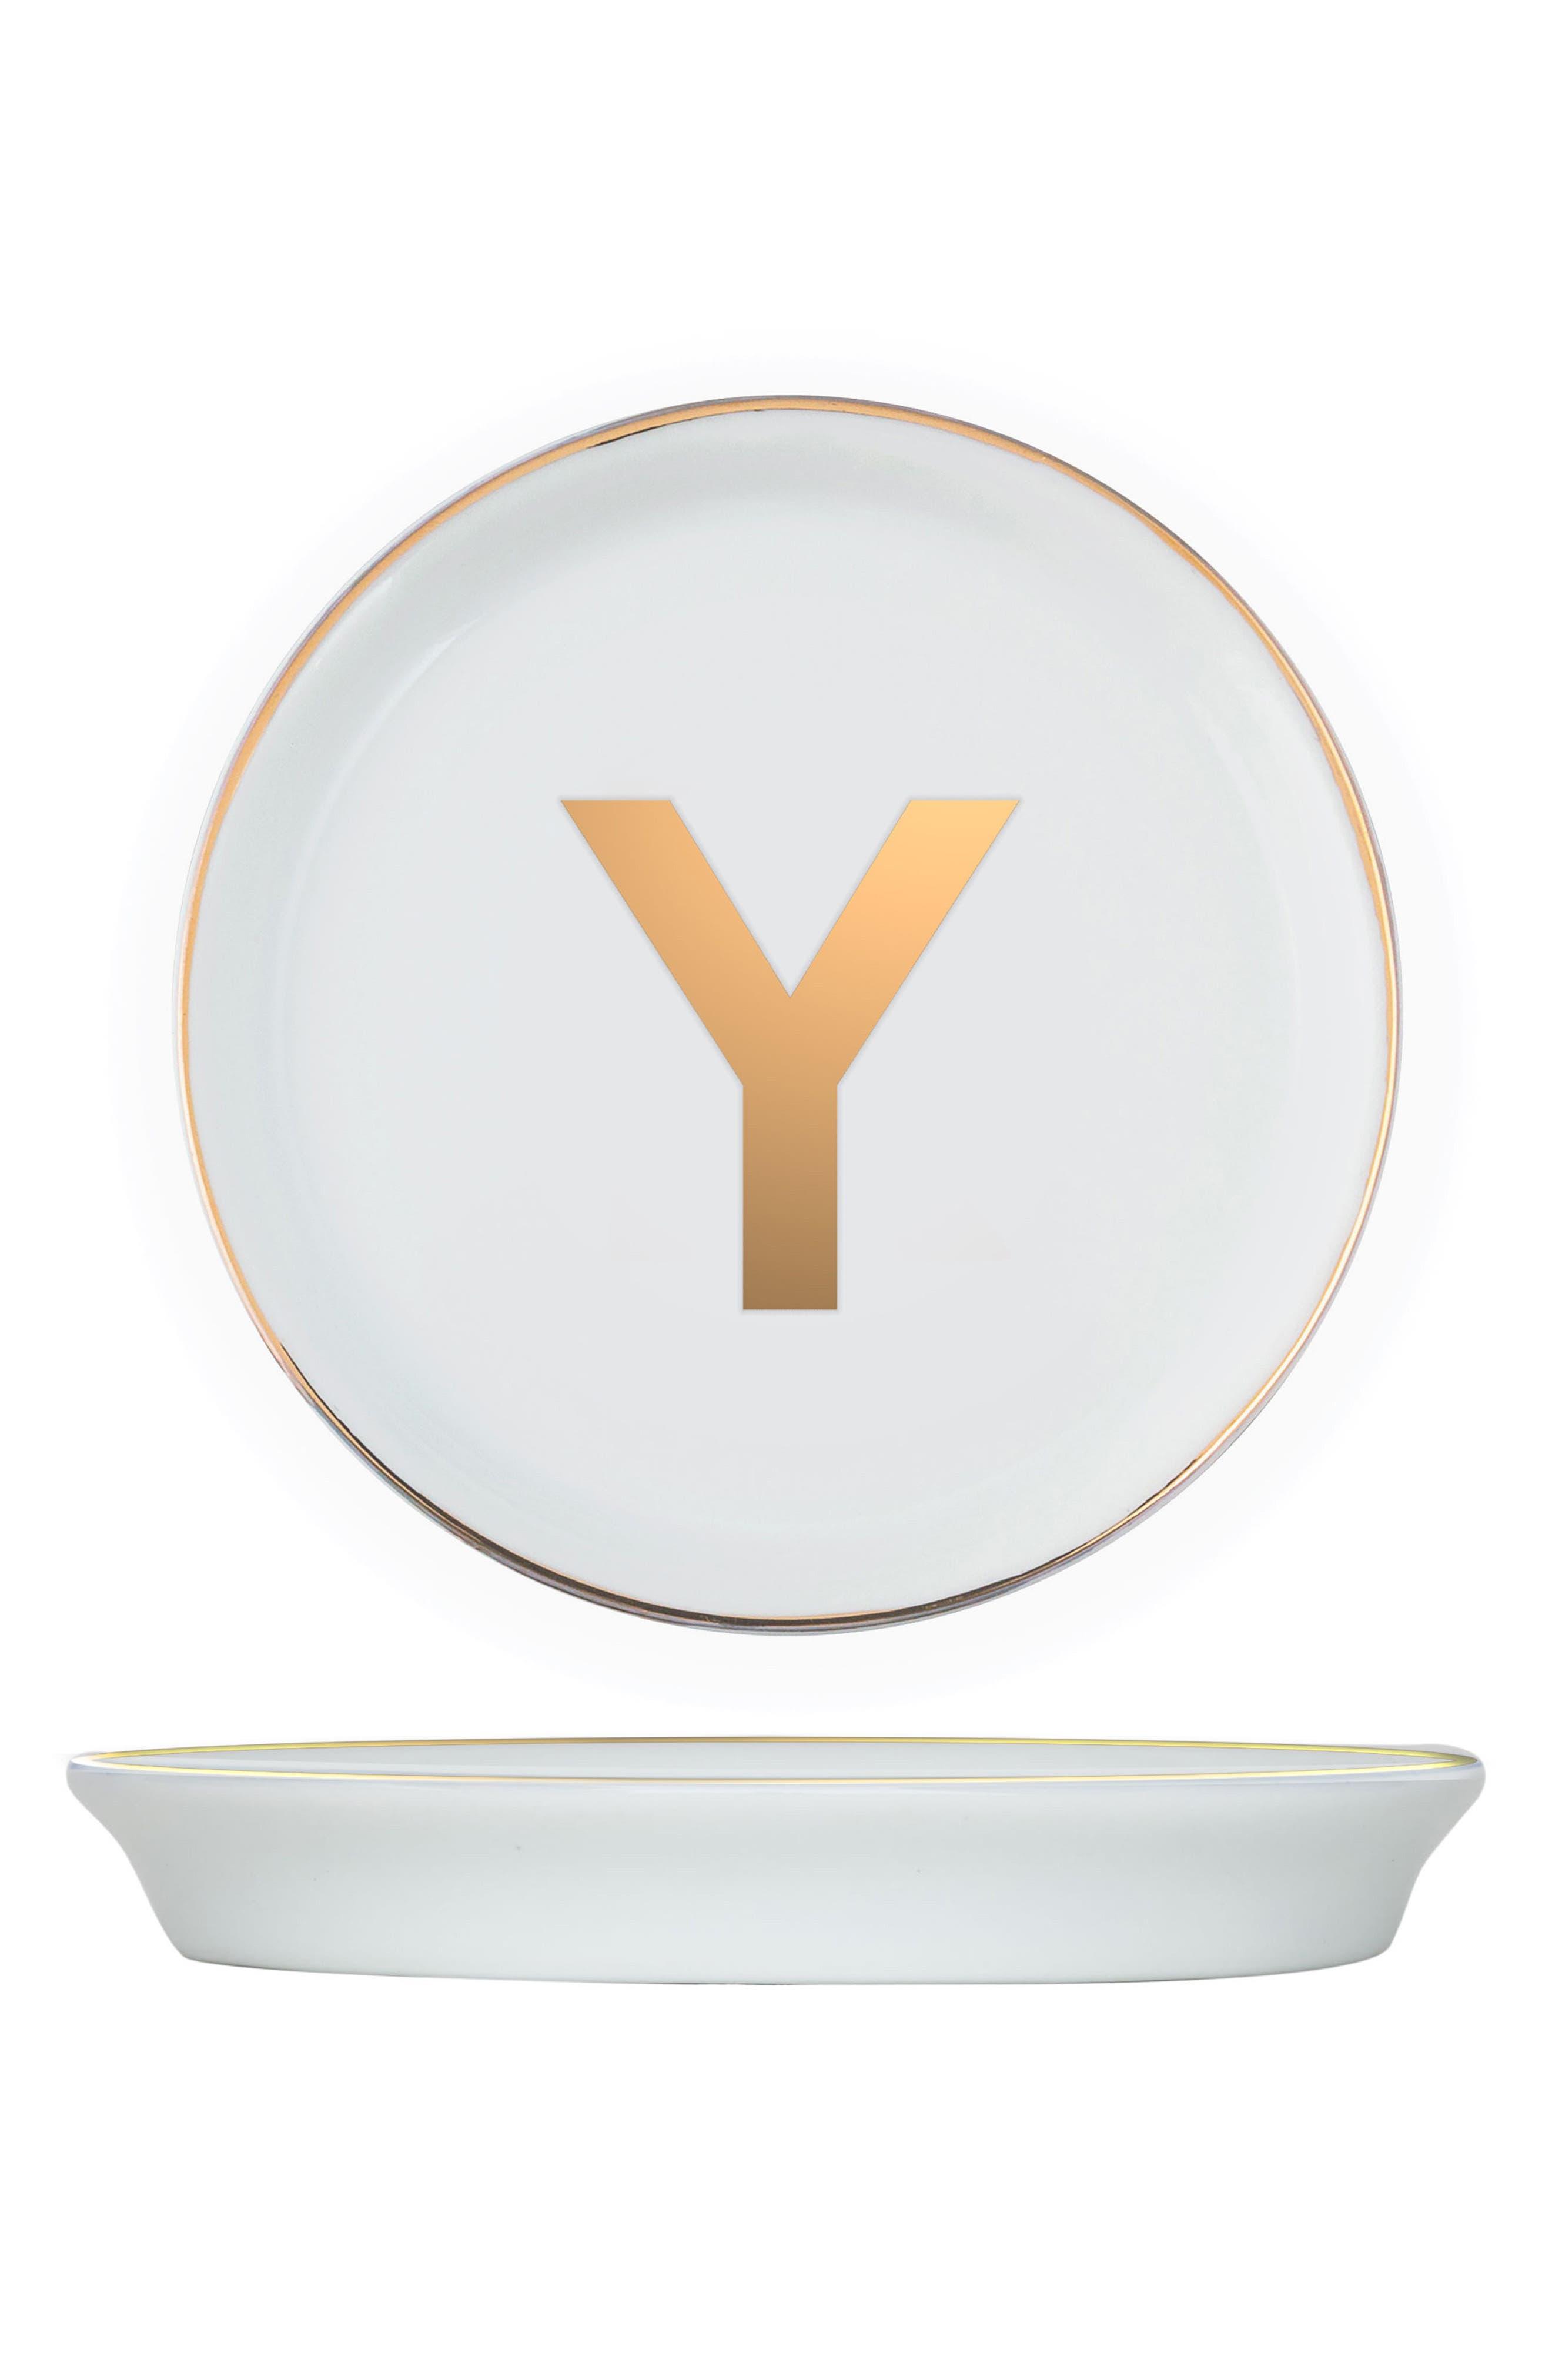 Brooklyn Set of 4 Porcelain Initial Coasters,                             Main thumbnail 1, color,                             Y